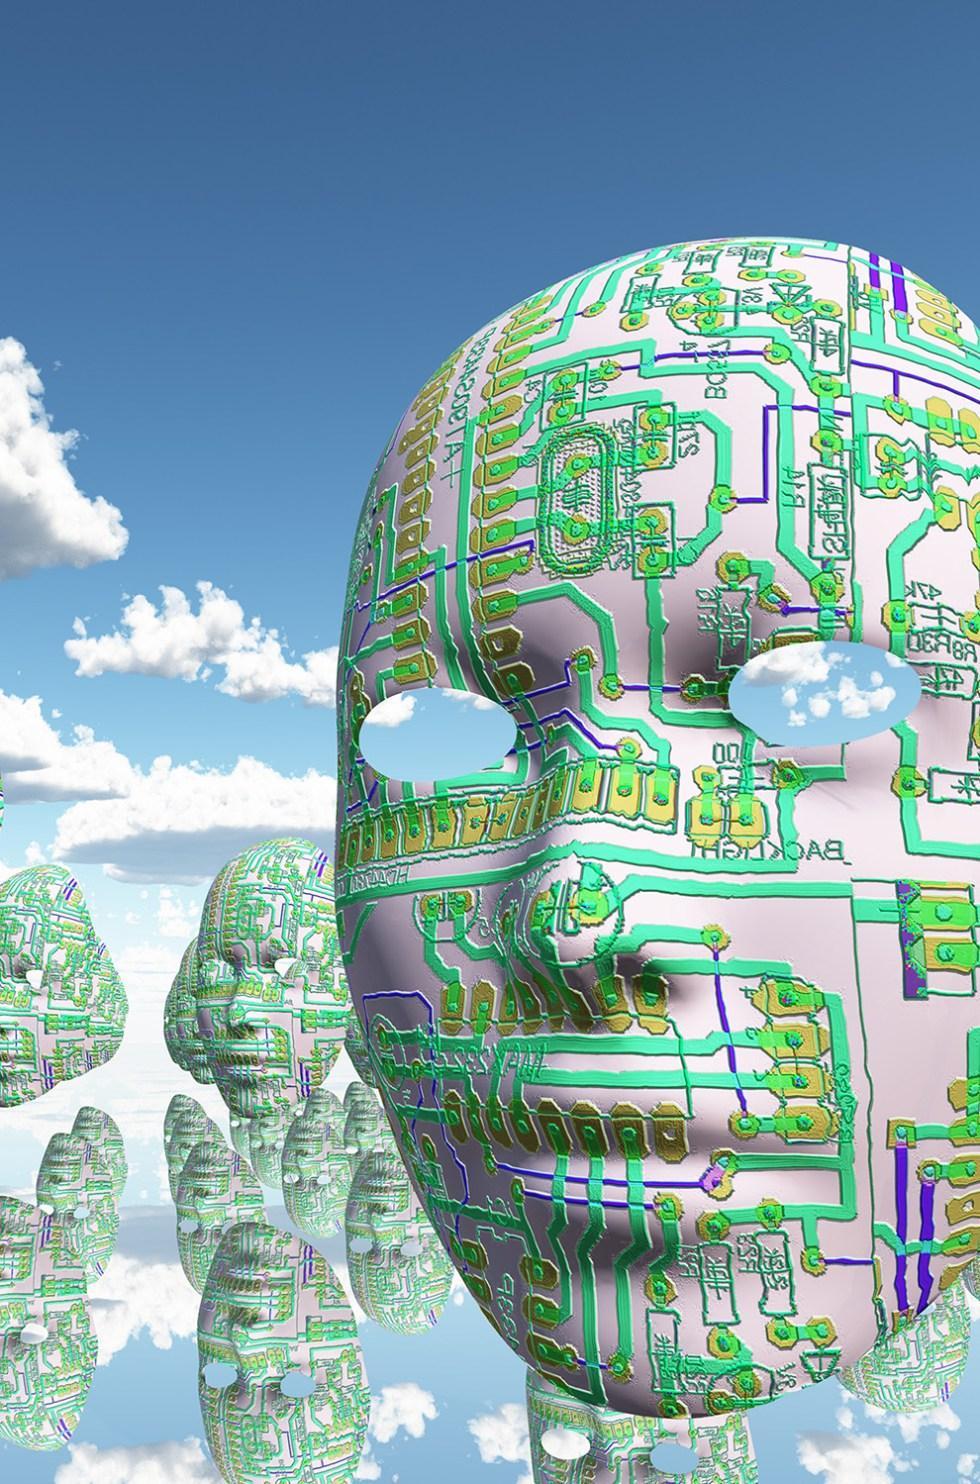 Electronic circuit faces in quiet surreal landscape